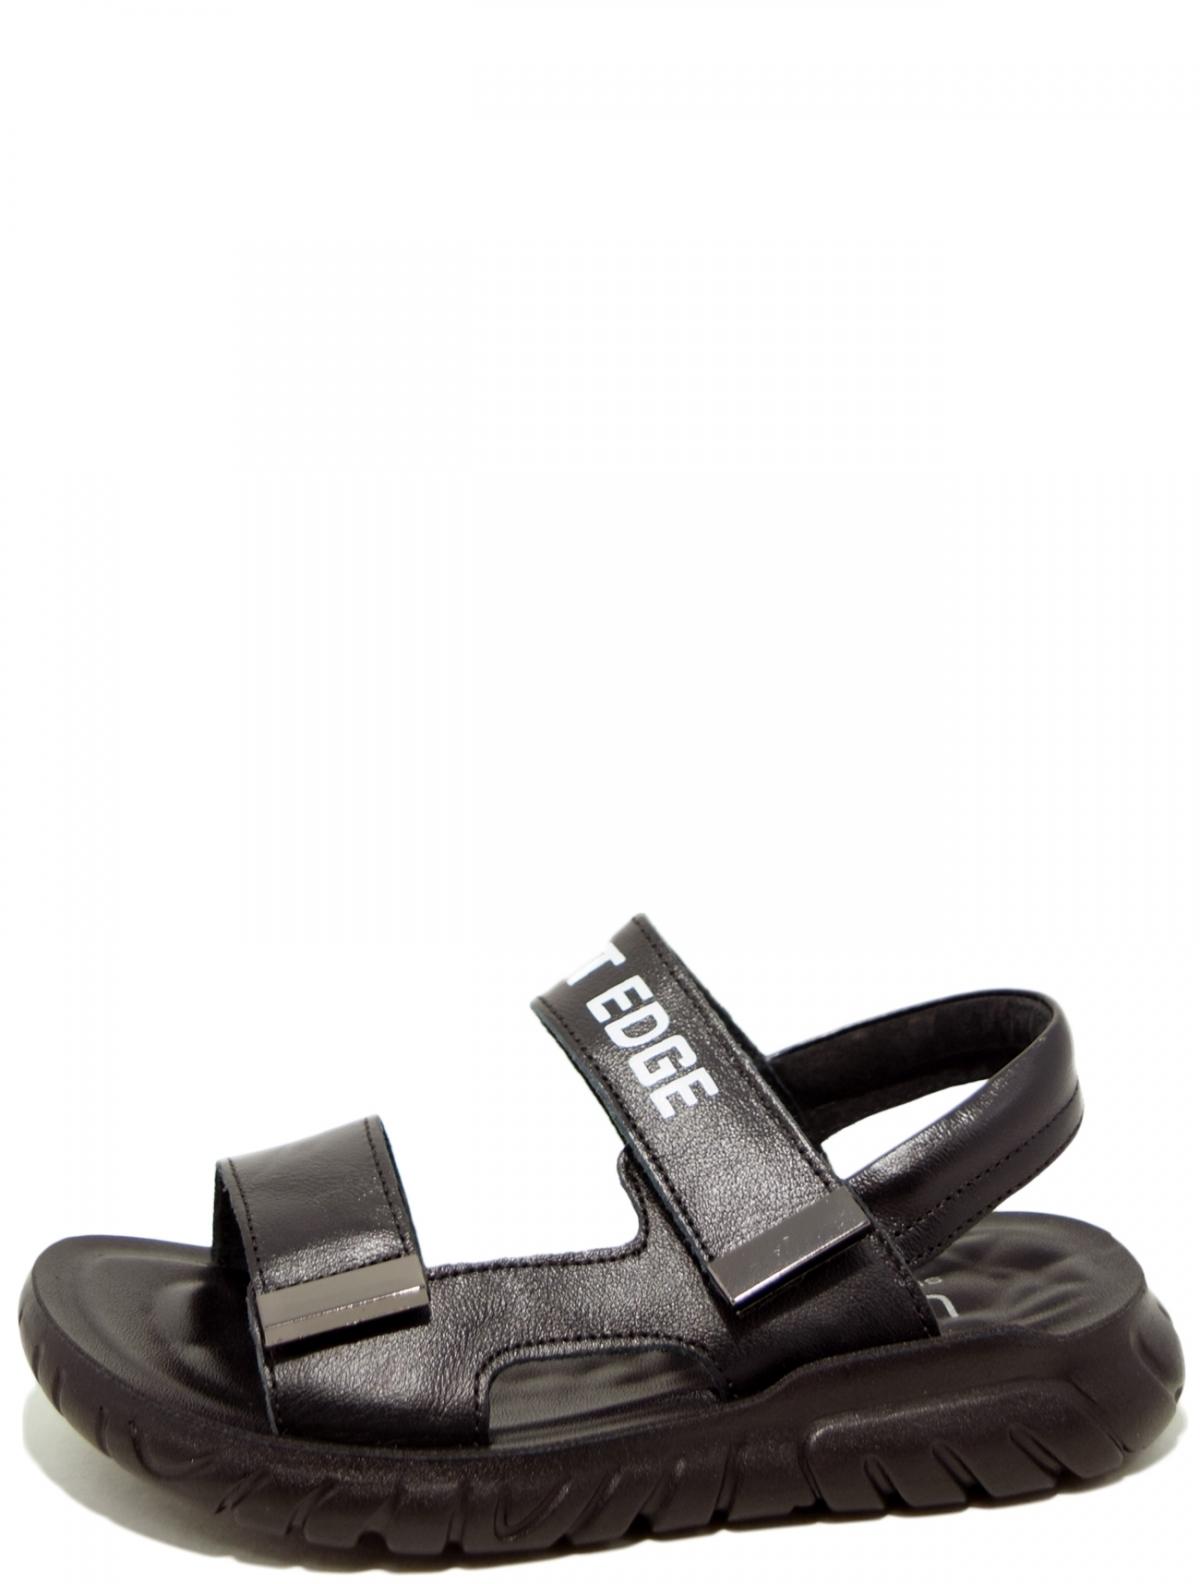 Ulet 1005/1 сандали для мальчика